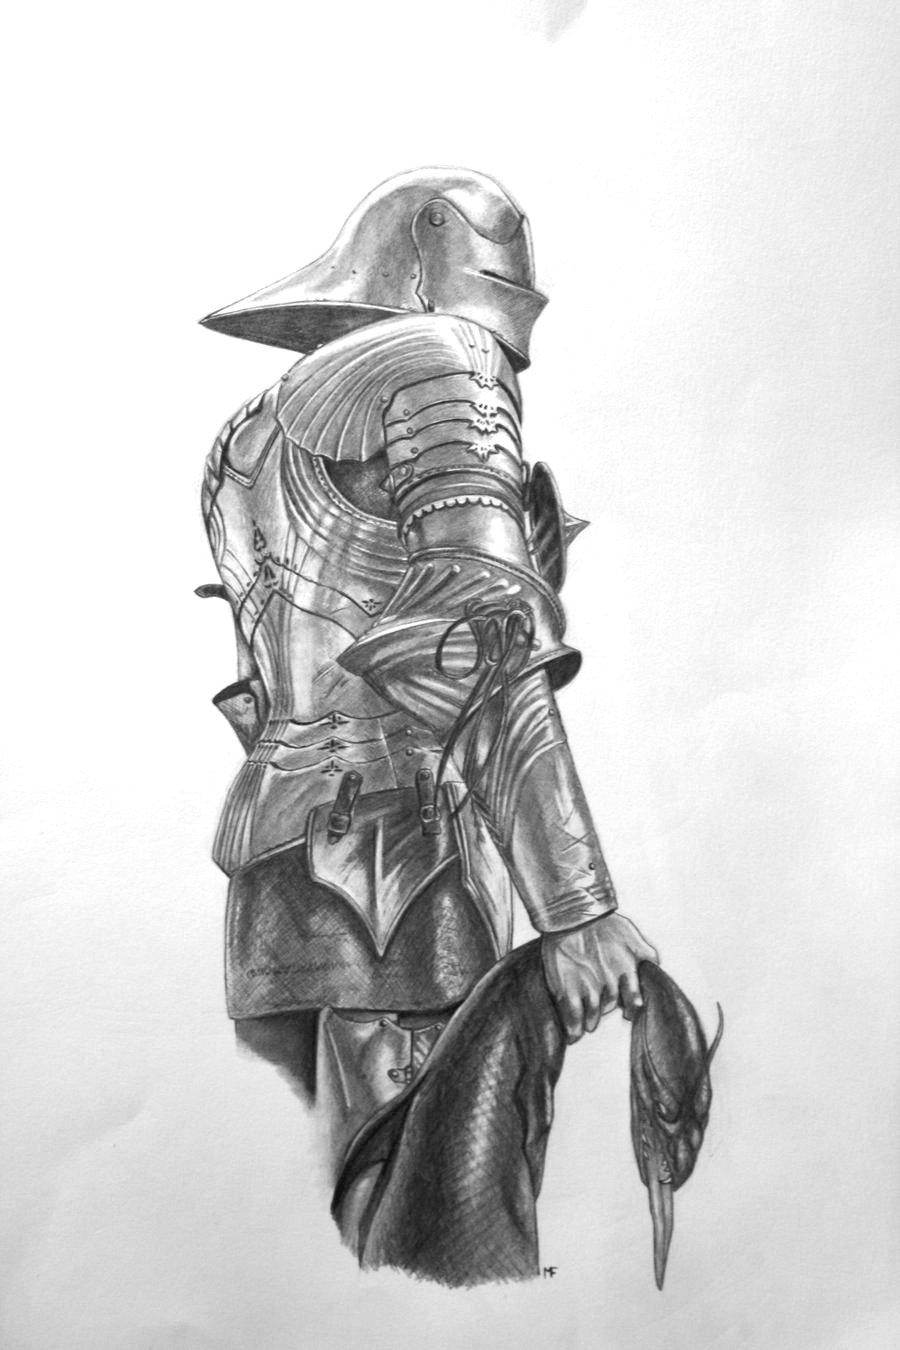 Sangria's Drawings Adcc86f2865244b8526d740a0b182fab-d5q66pd